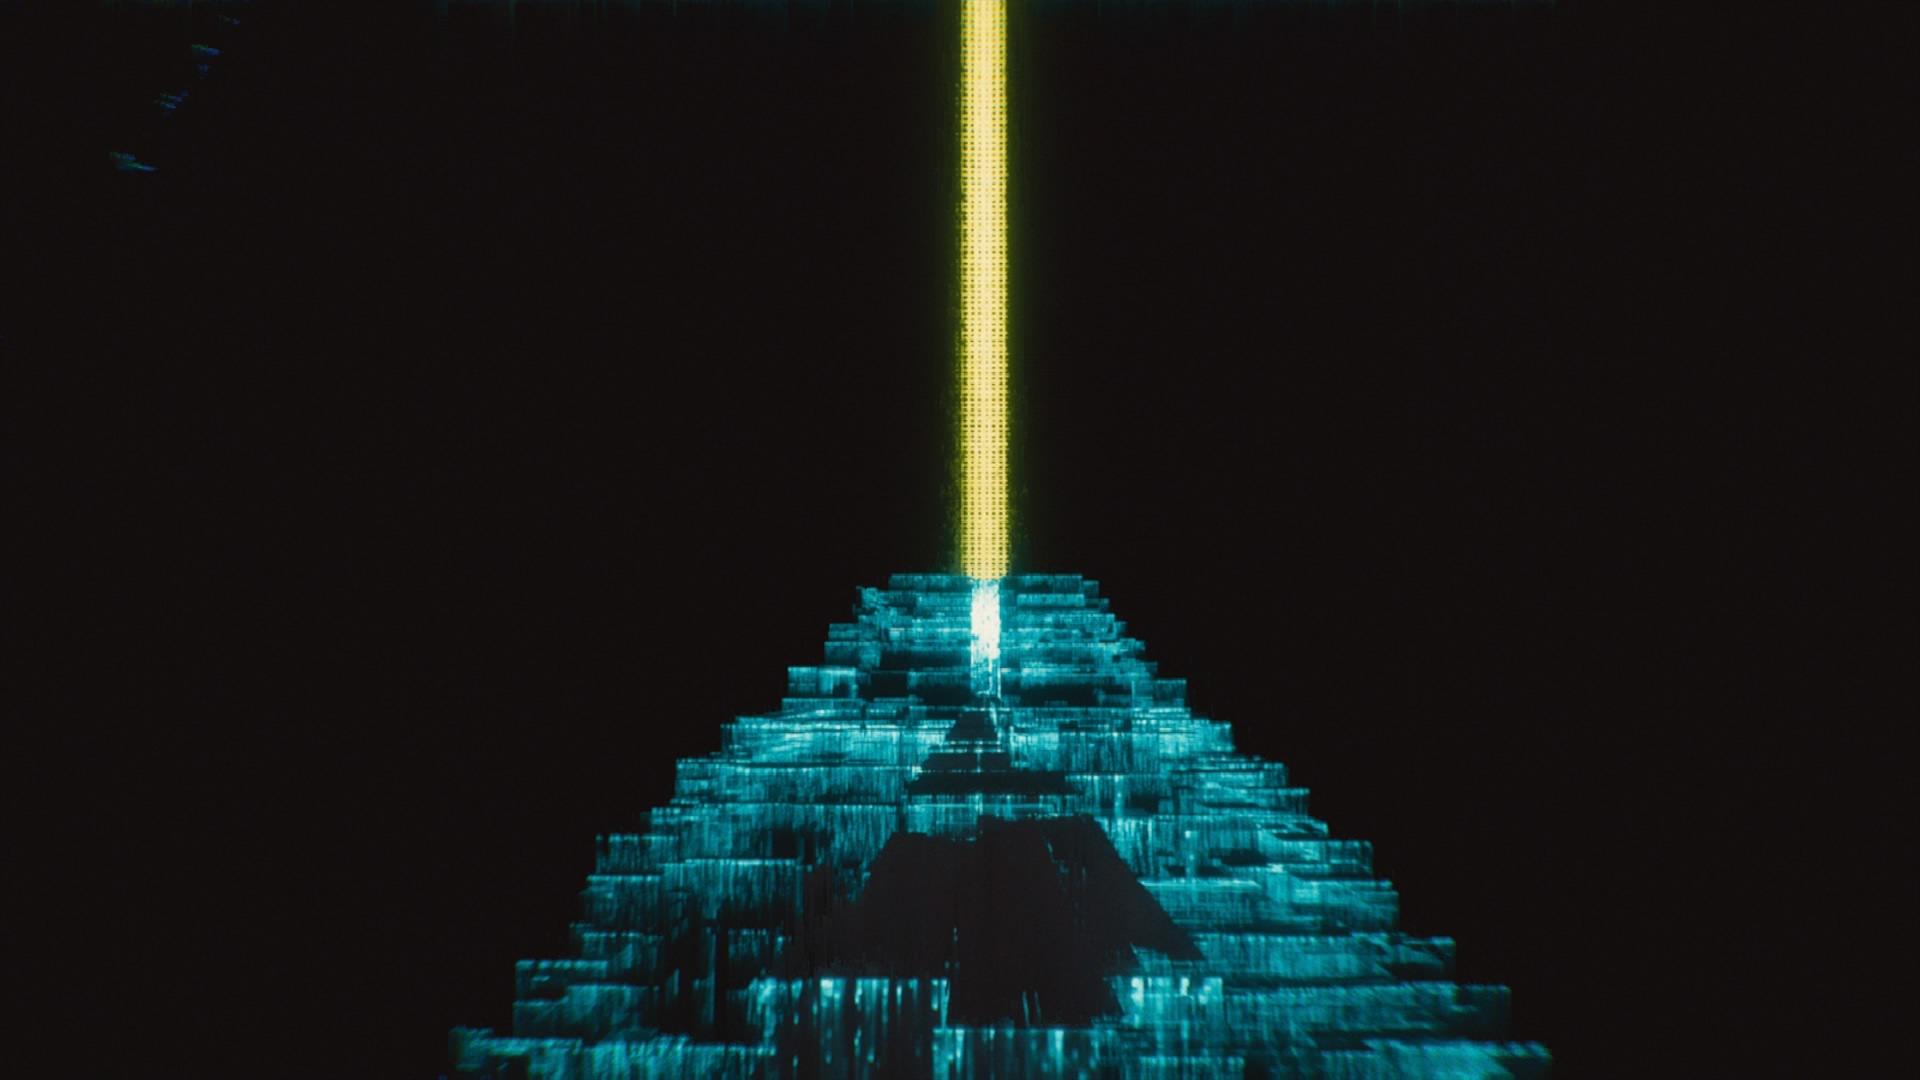 CP77_R3S5_Pyramid-of-Light.jpg